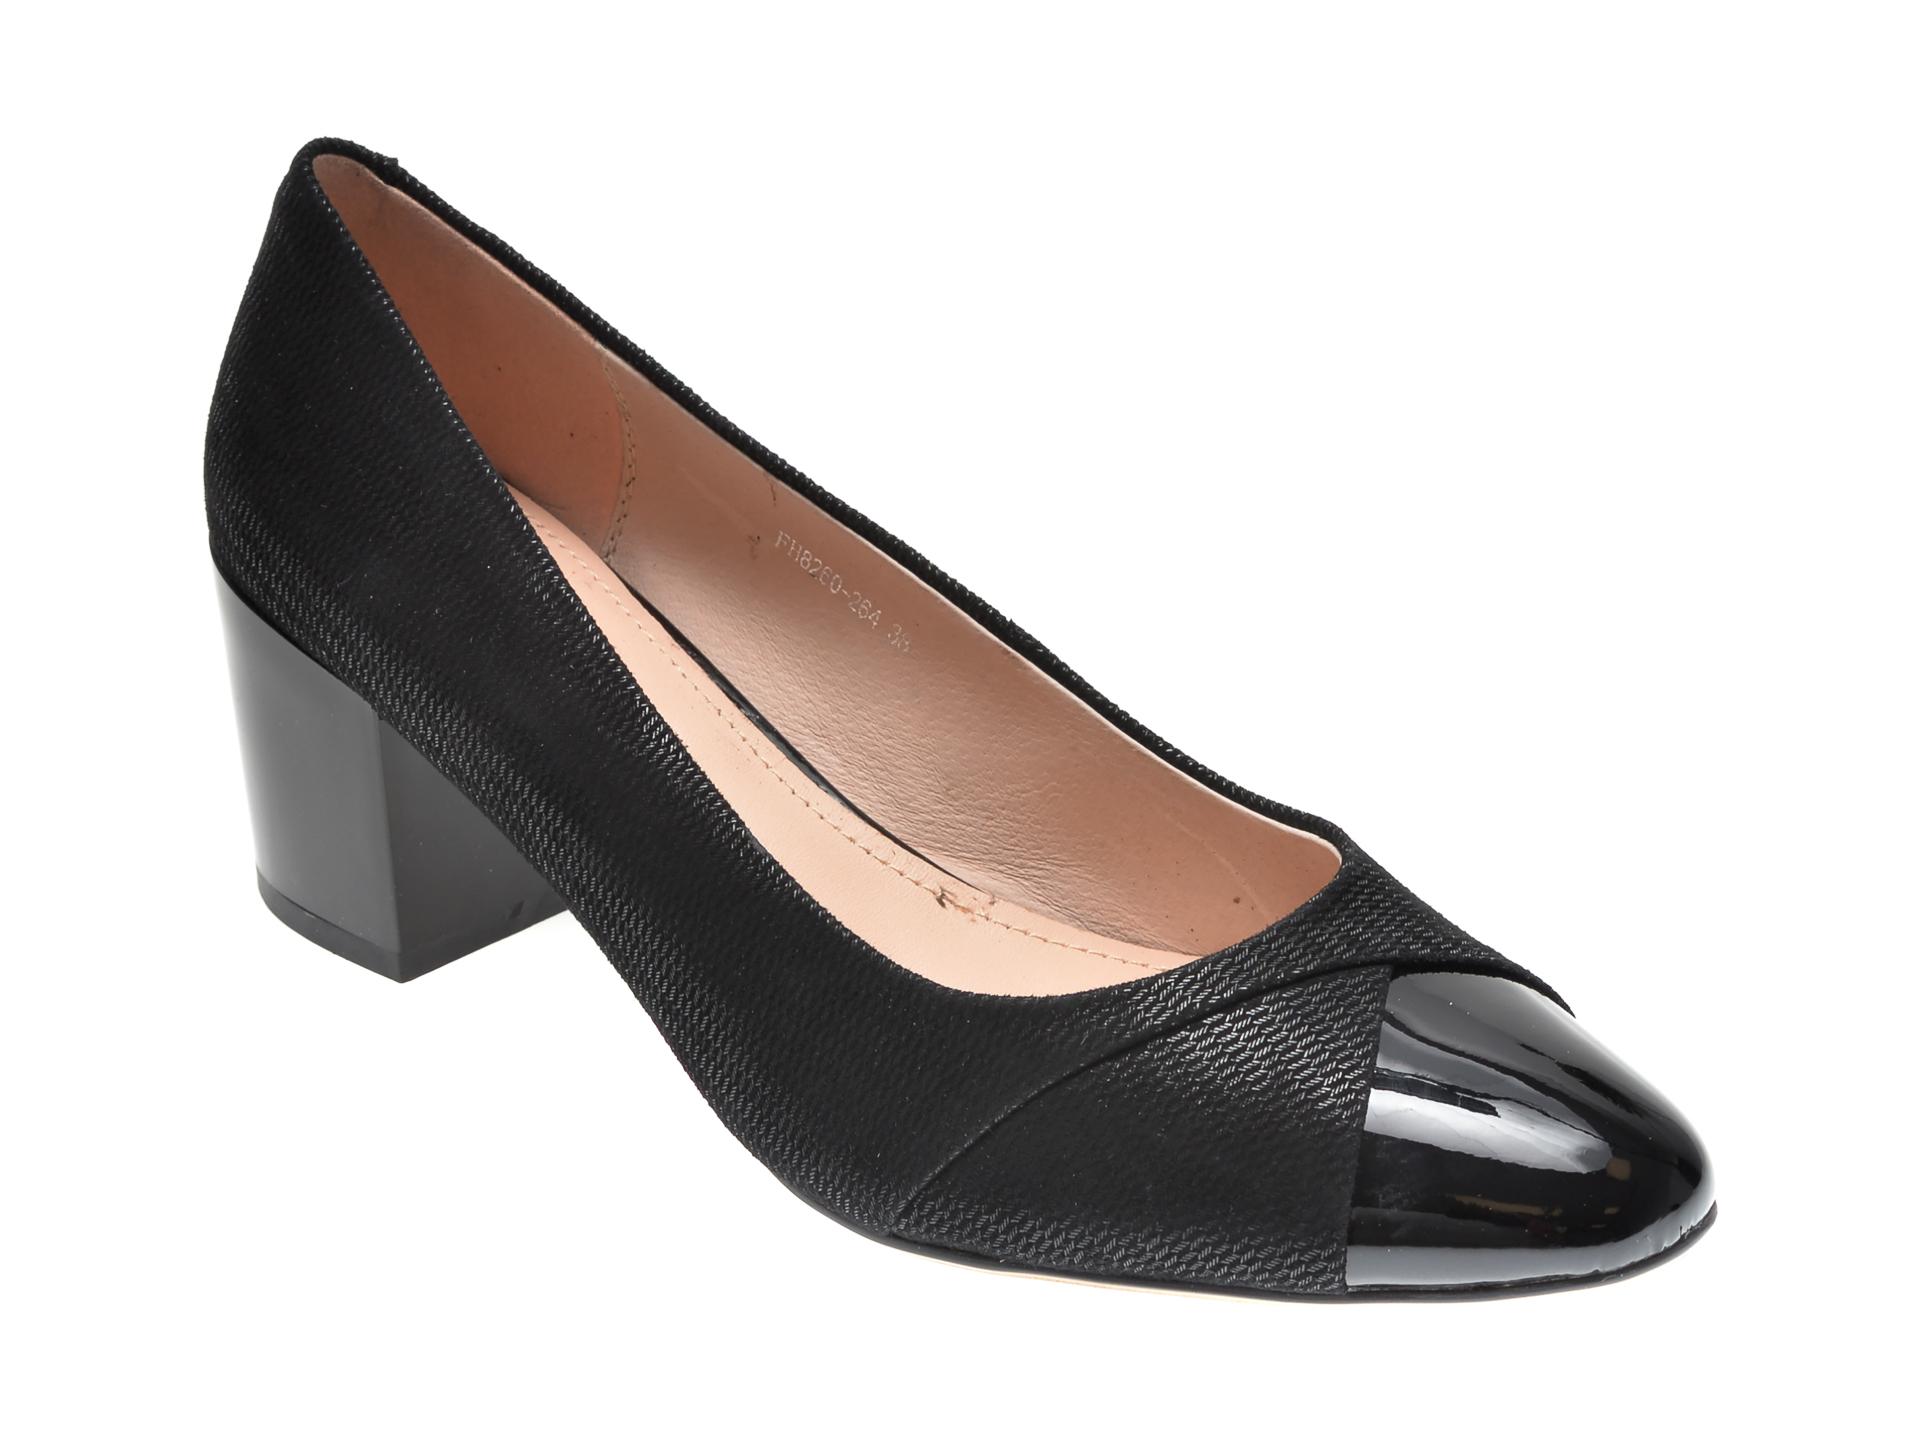 Pantofi KARISMA negri, 8260264, din piele intoarsa imagine